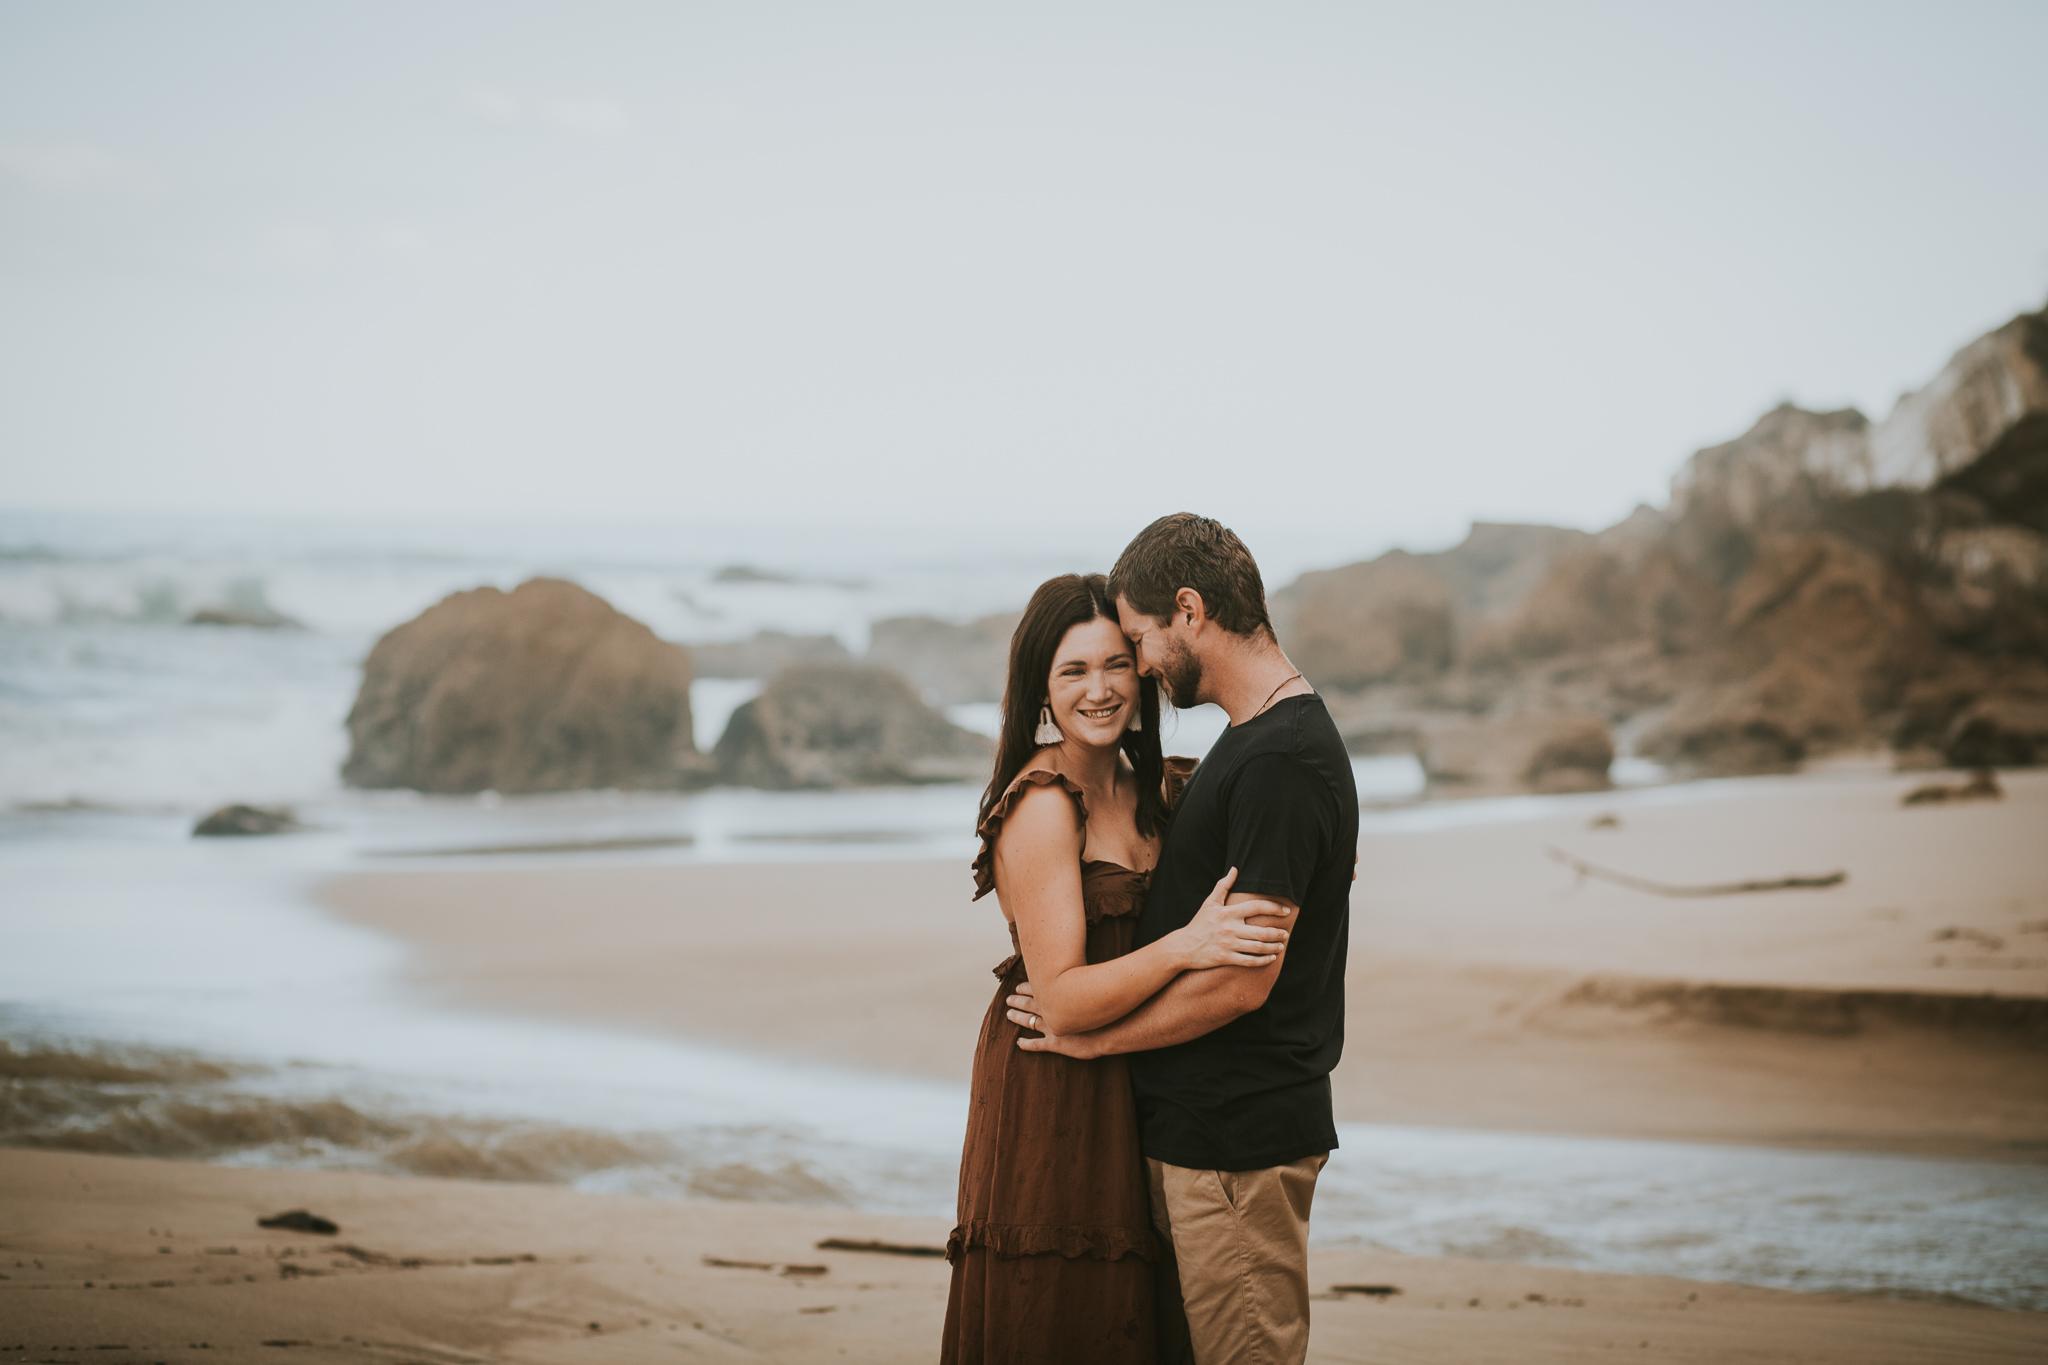 Nz Hawkes Bay Napier Wedding photographer waipatiki beach-50.jpg